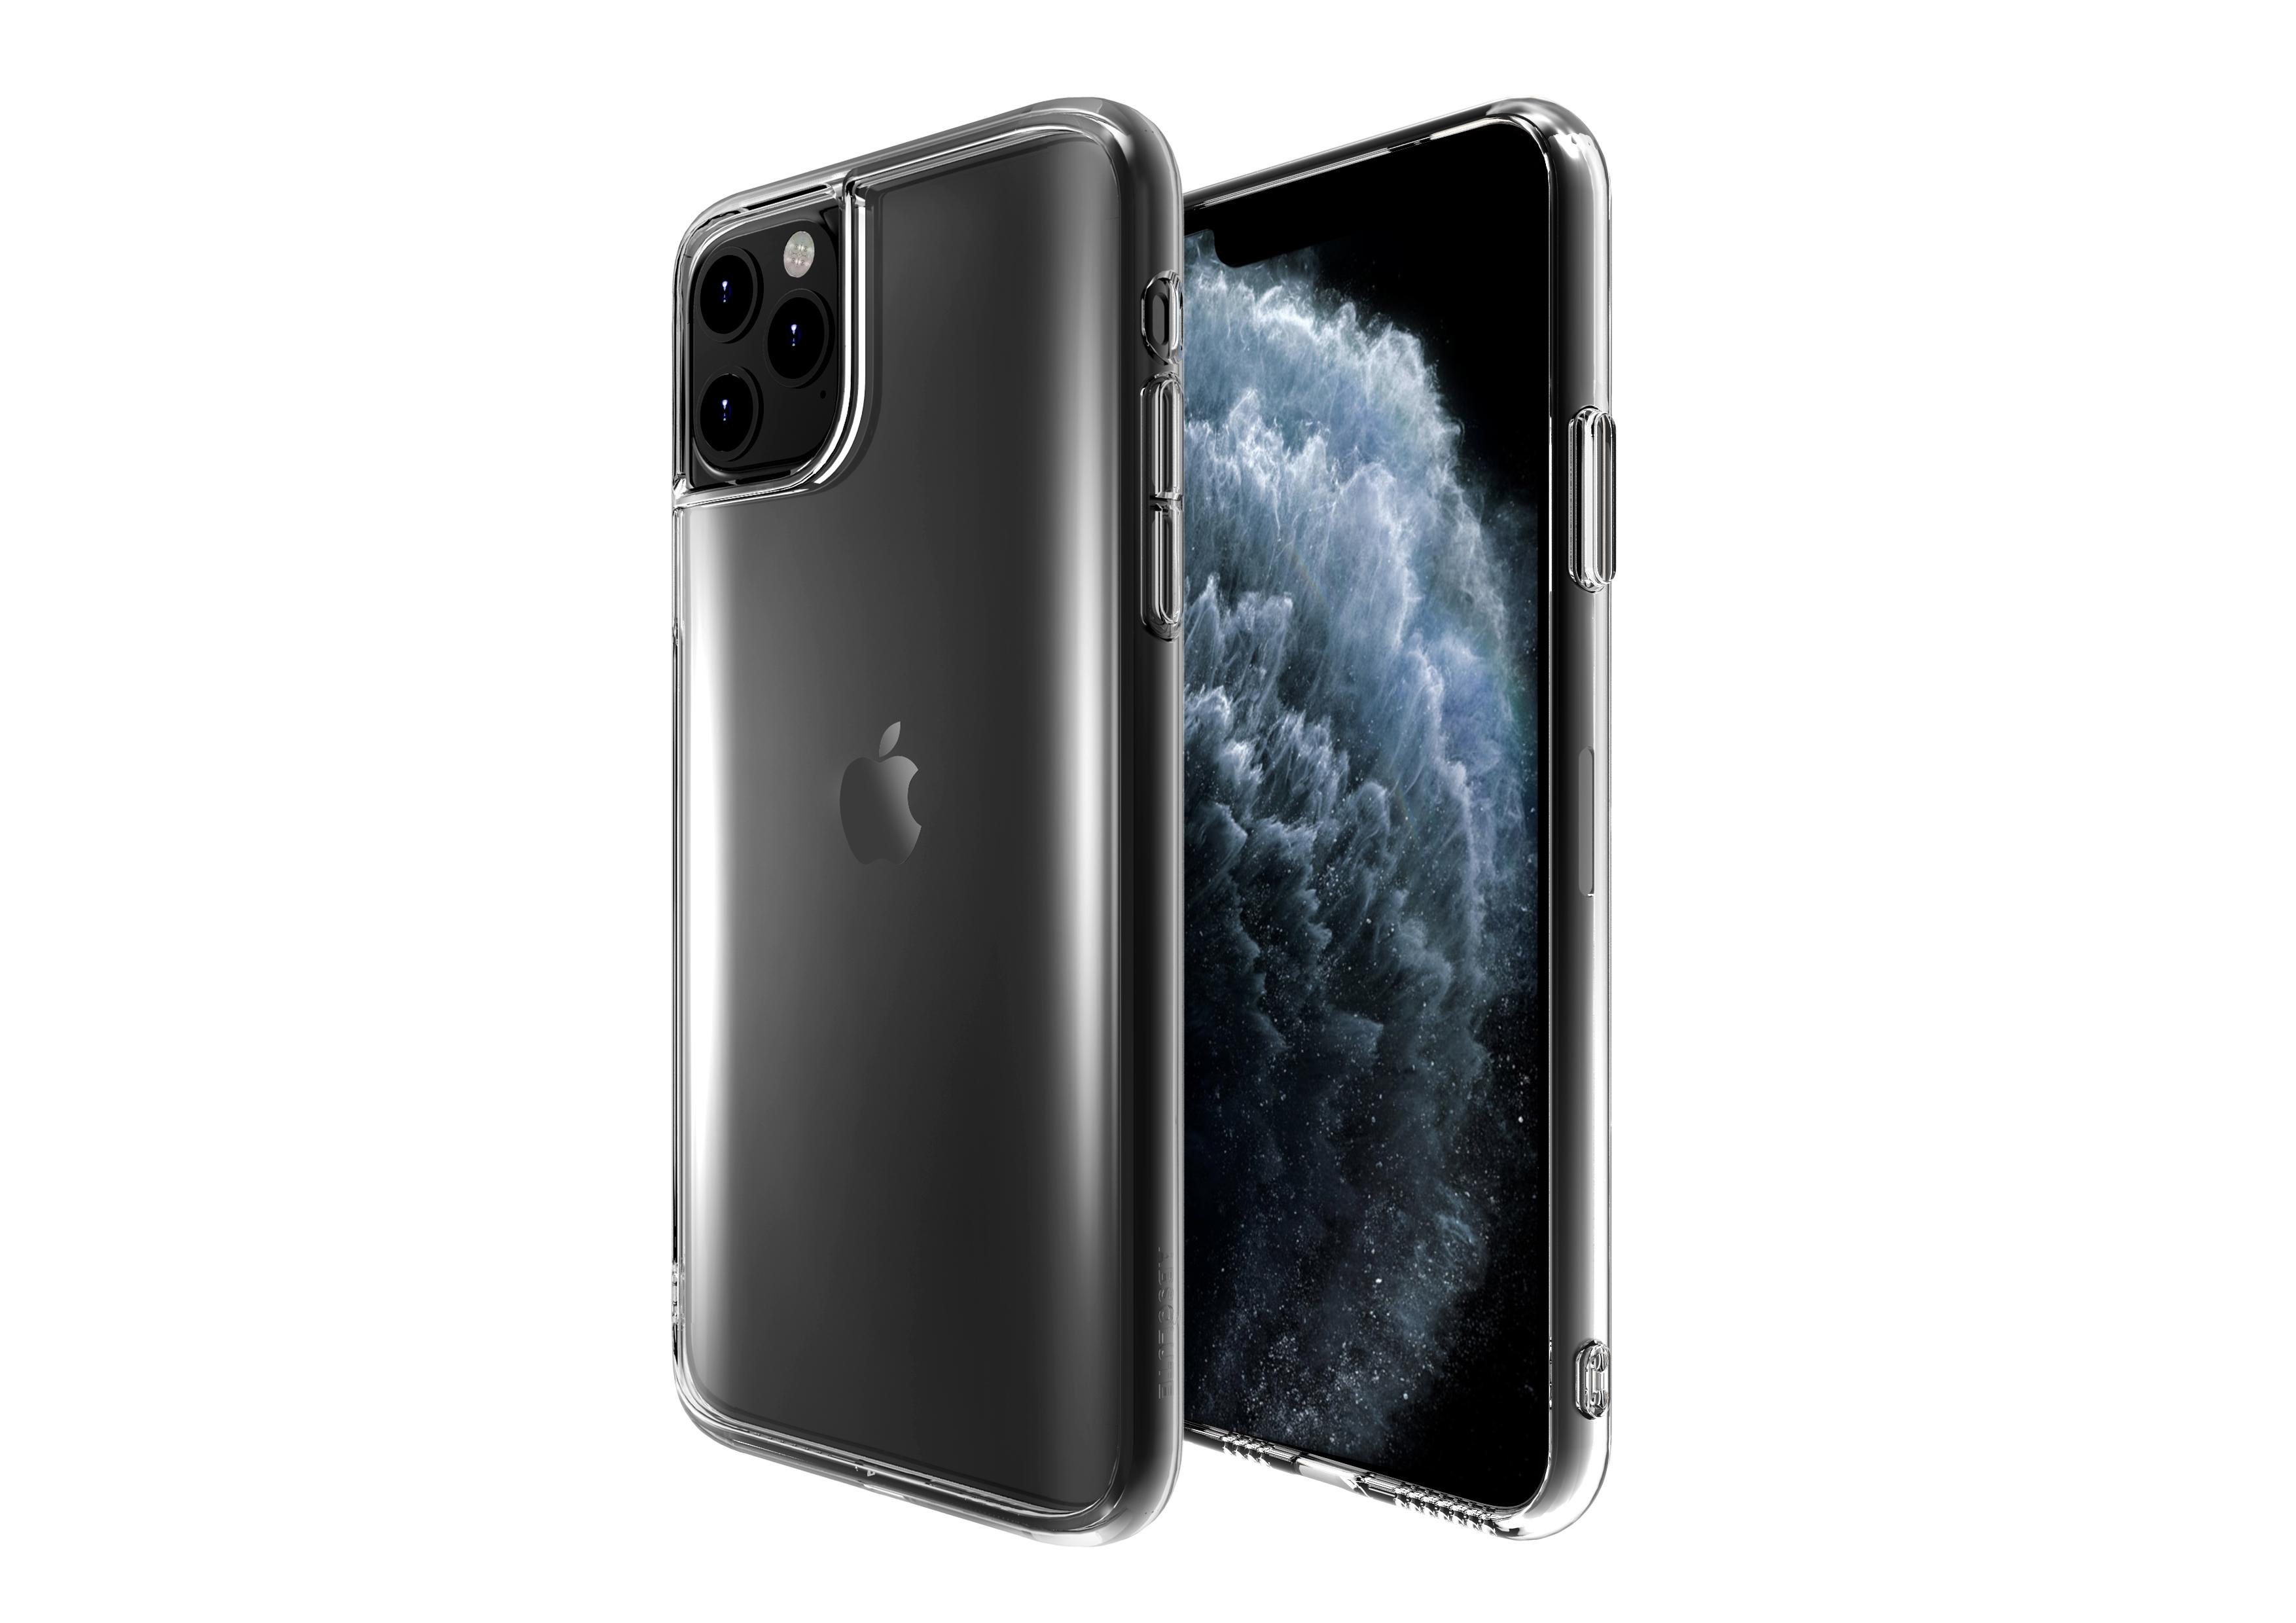 iPhone11 Pro Max-Black for pro ADM